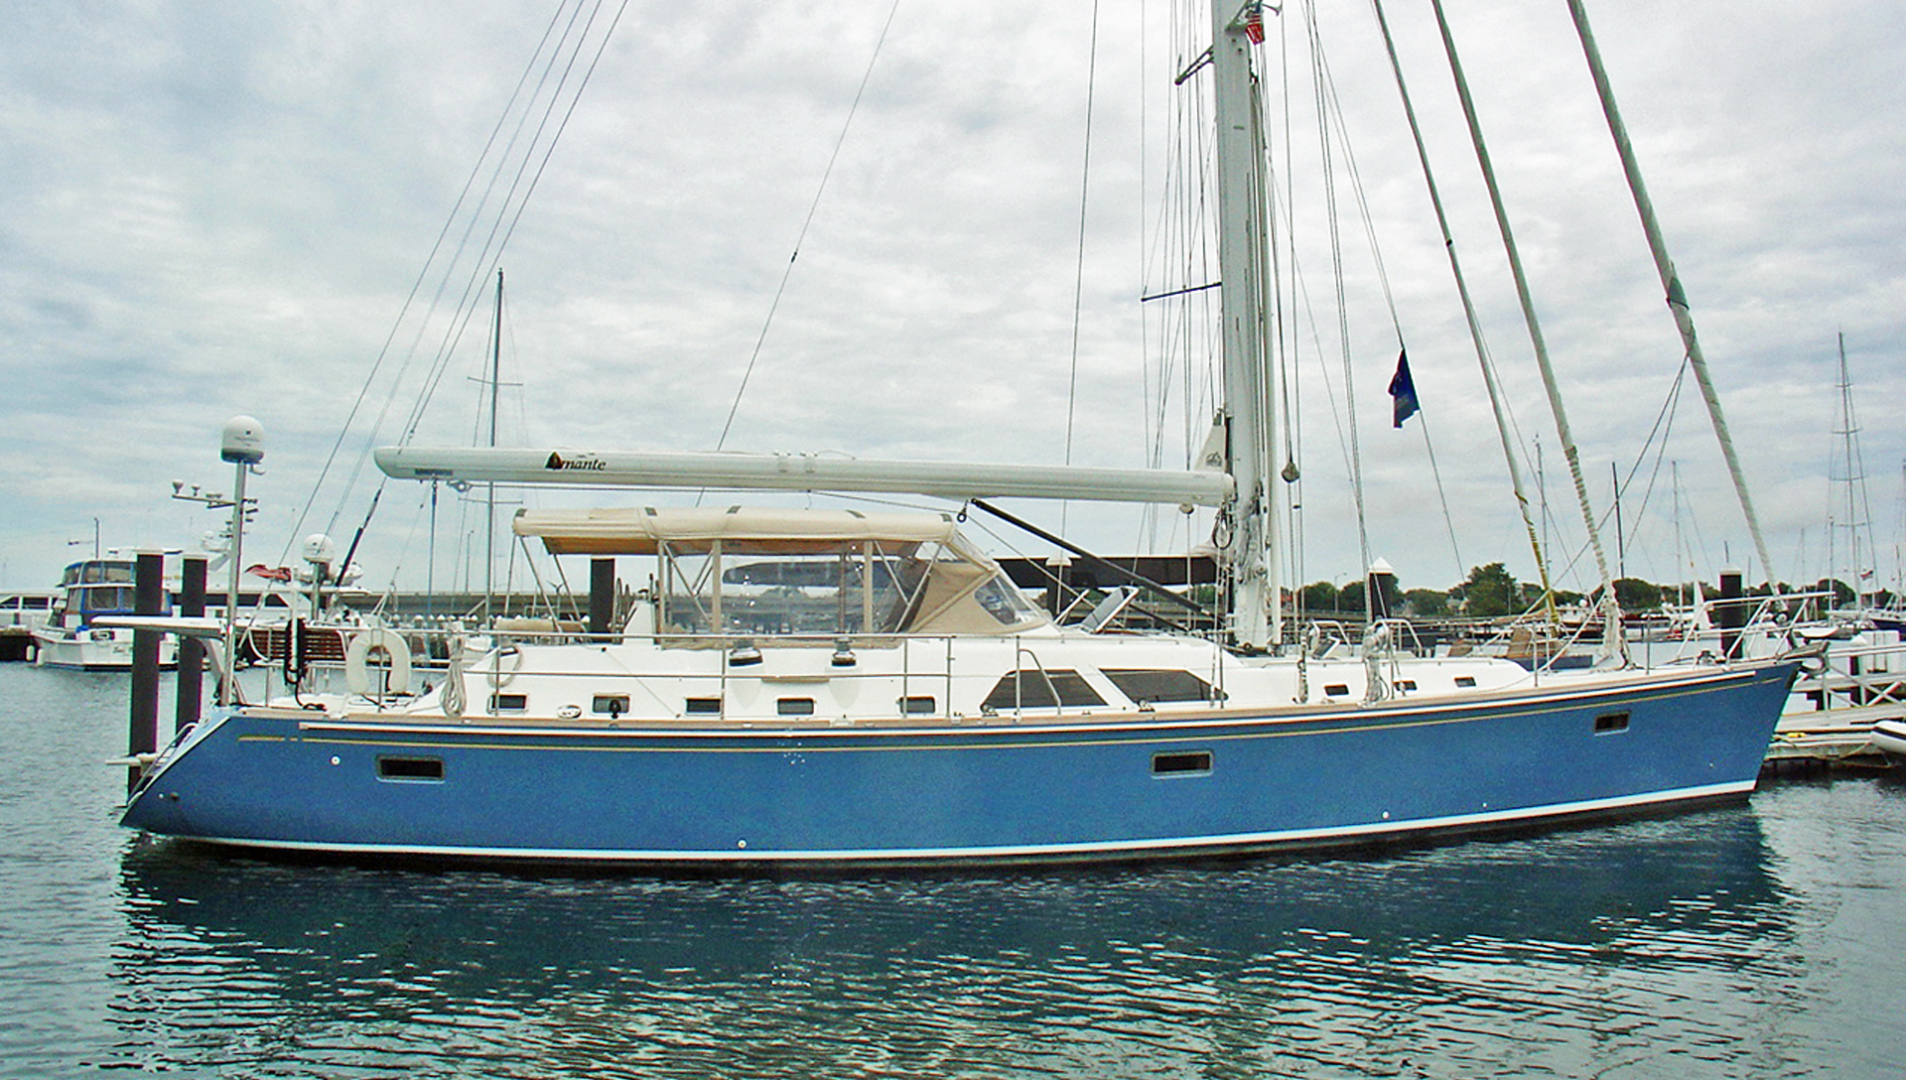 Hylas-70 Centerboard Cruiser 2007-AMANTE Barcelona-Spain-Profile-1555662   Thumbnail